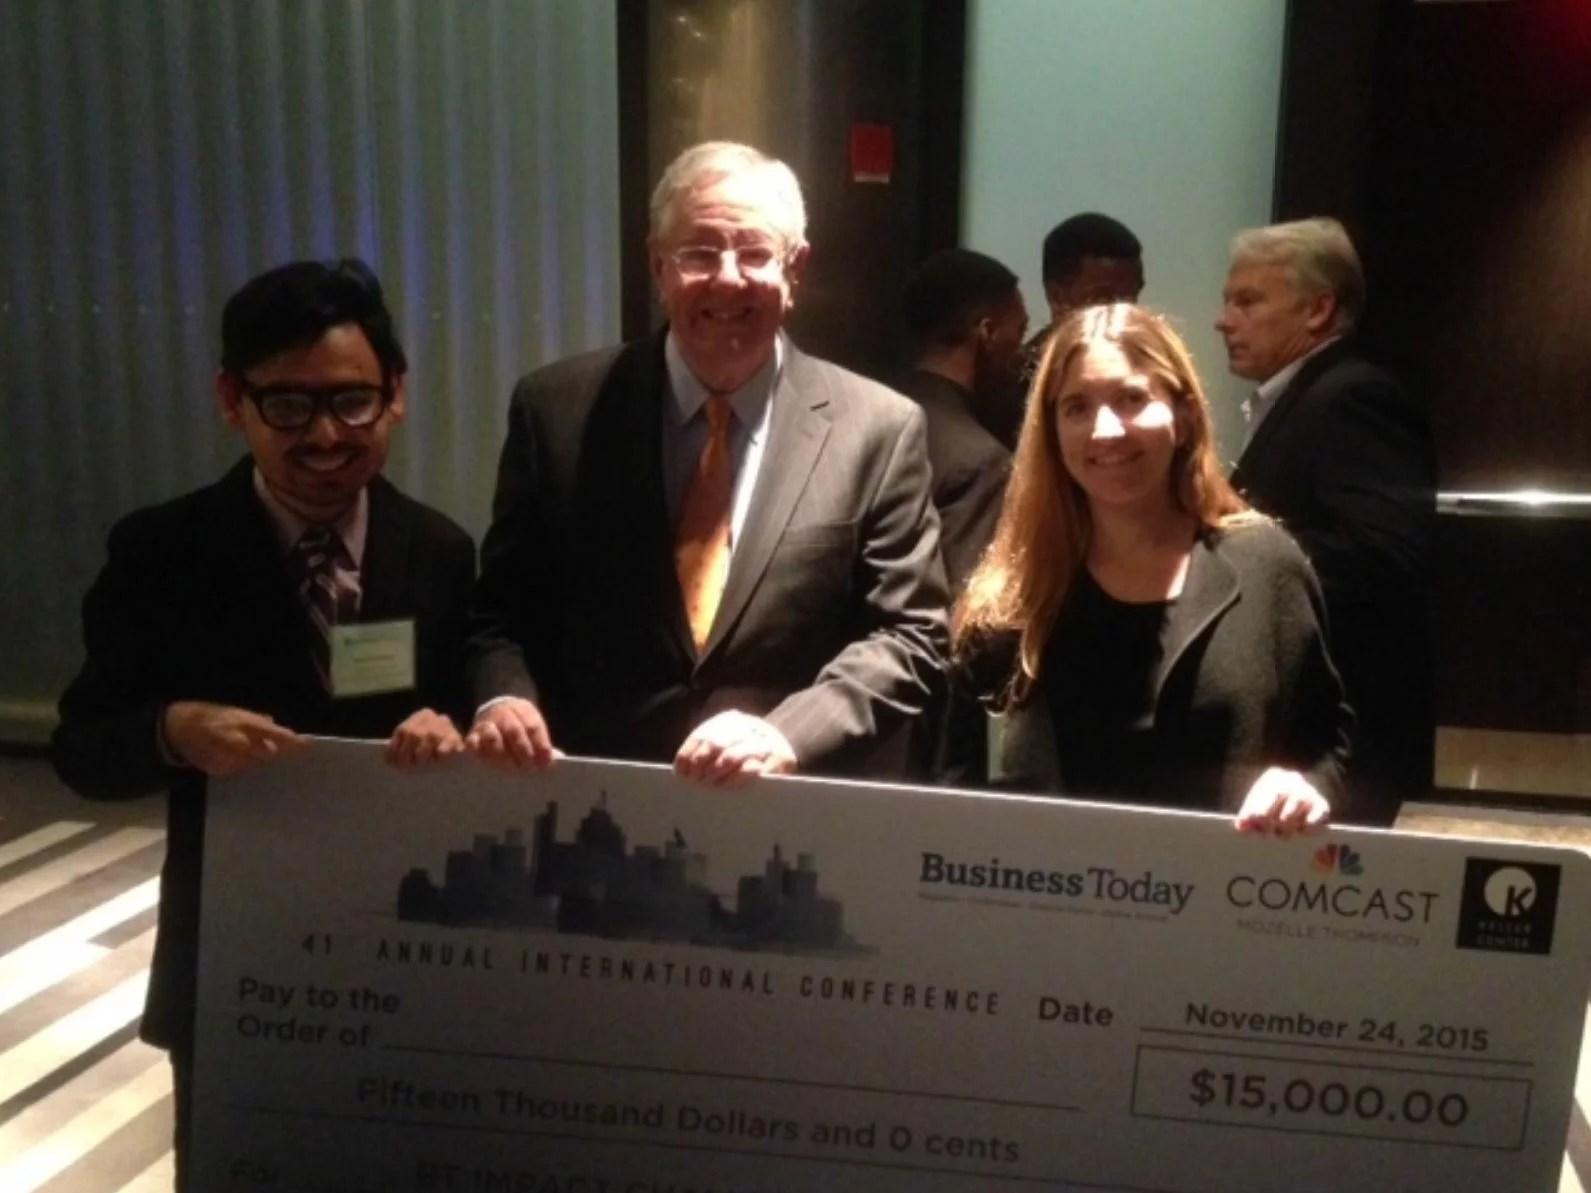 Winner of 2015 Business Today Impact Challenge